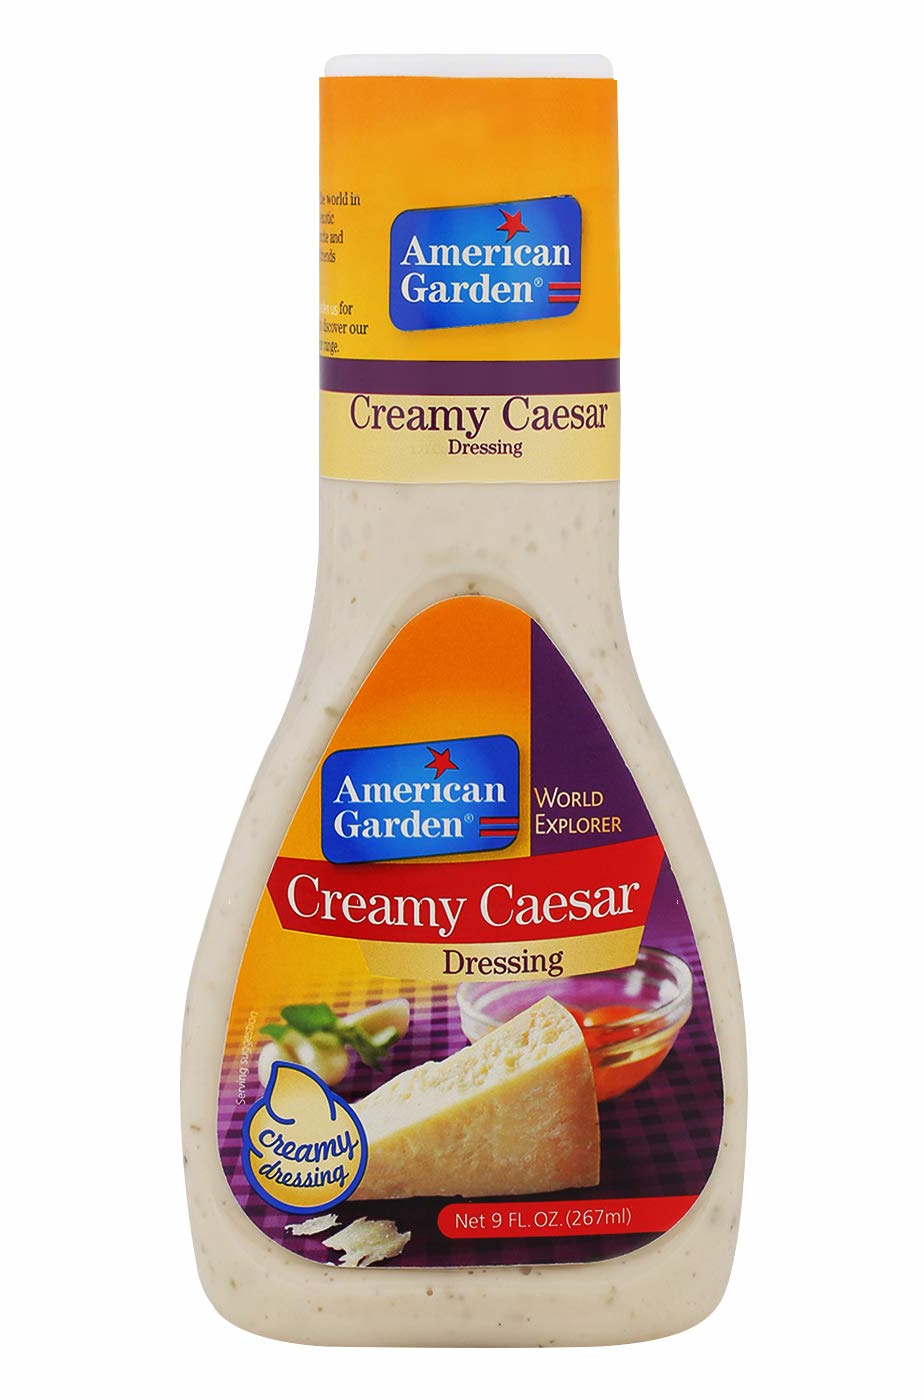 American Garden CREAMY CAESAR Dressing 267ml